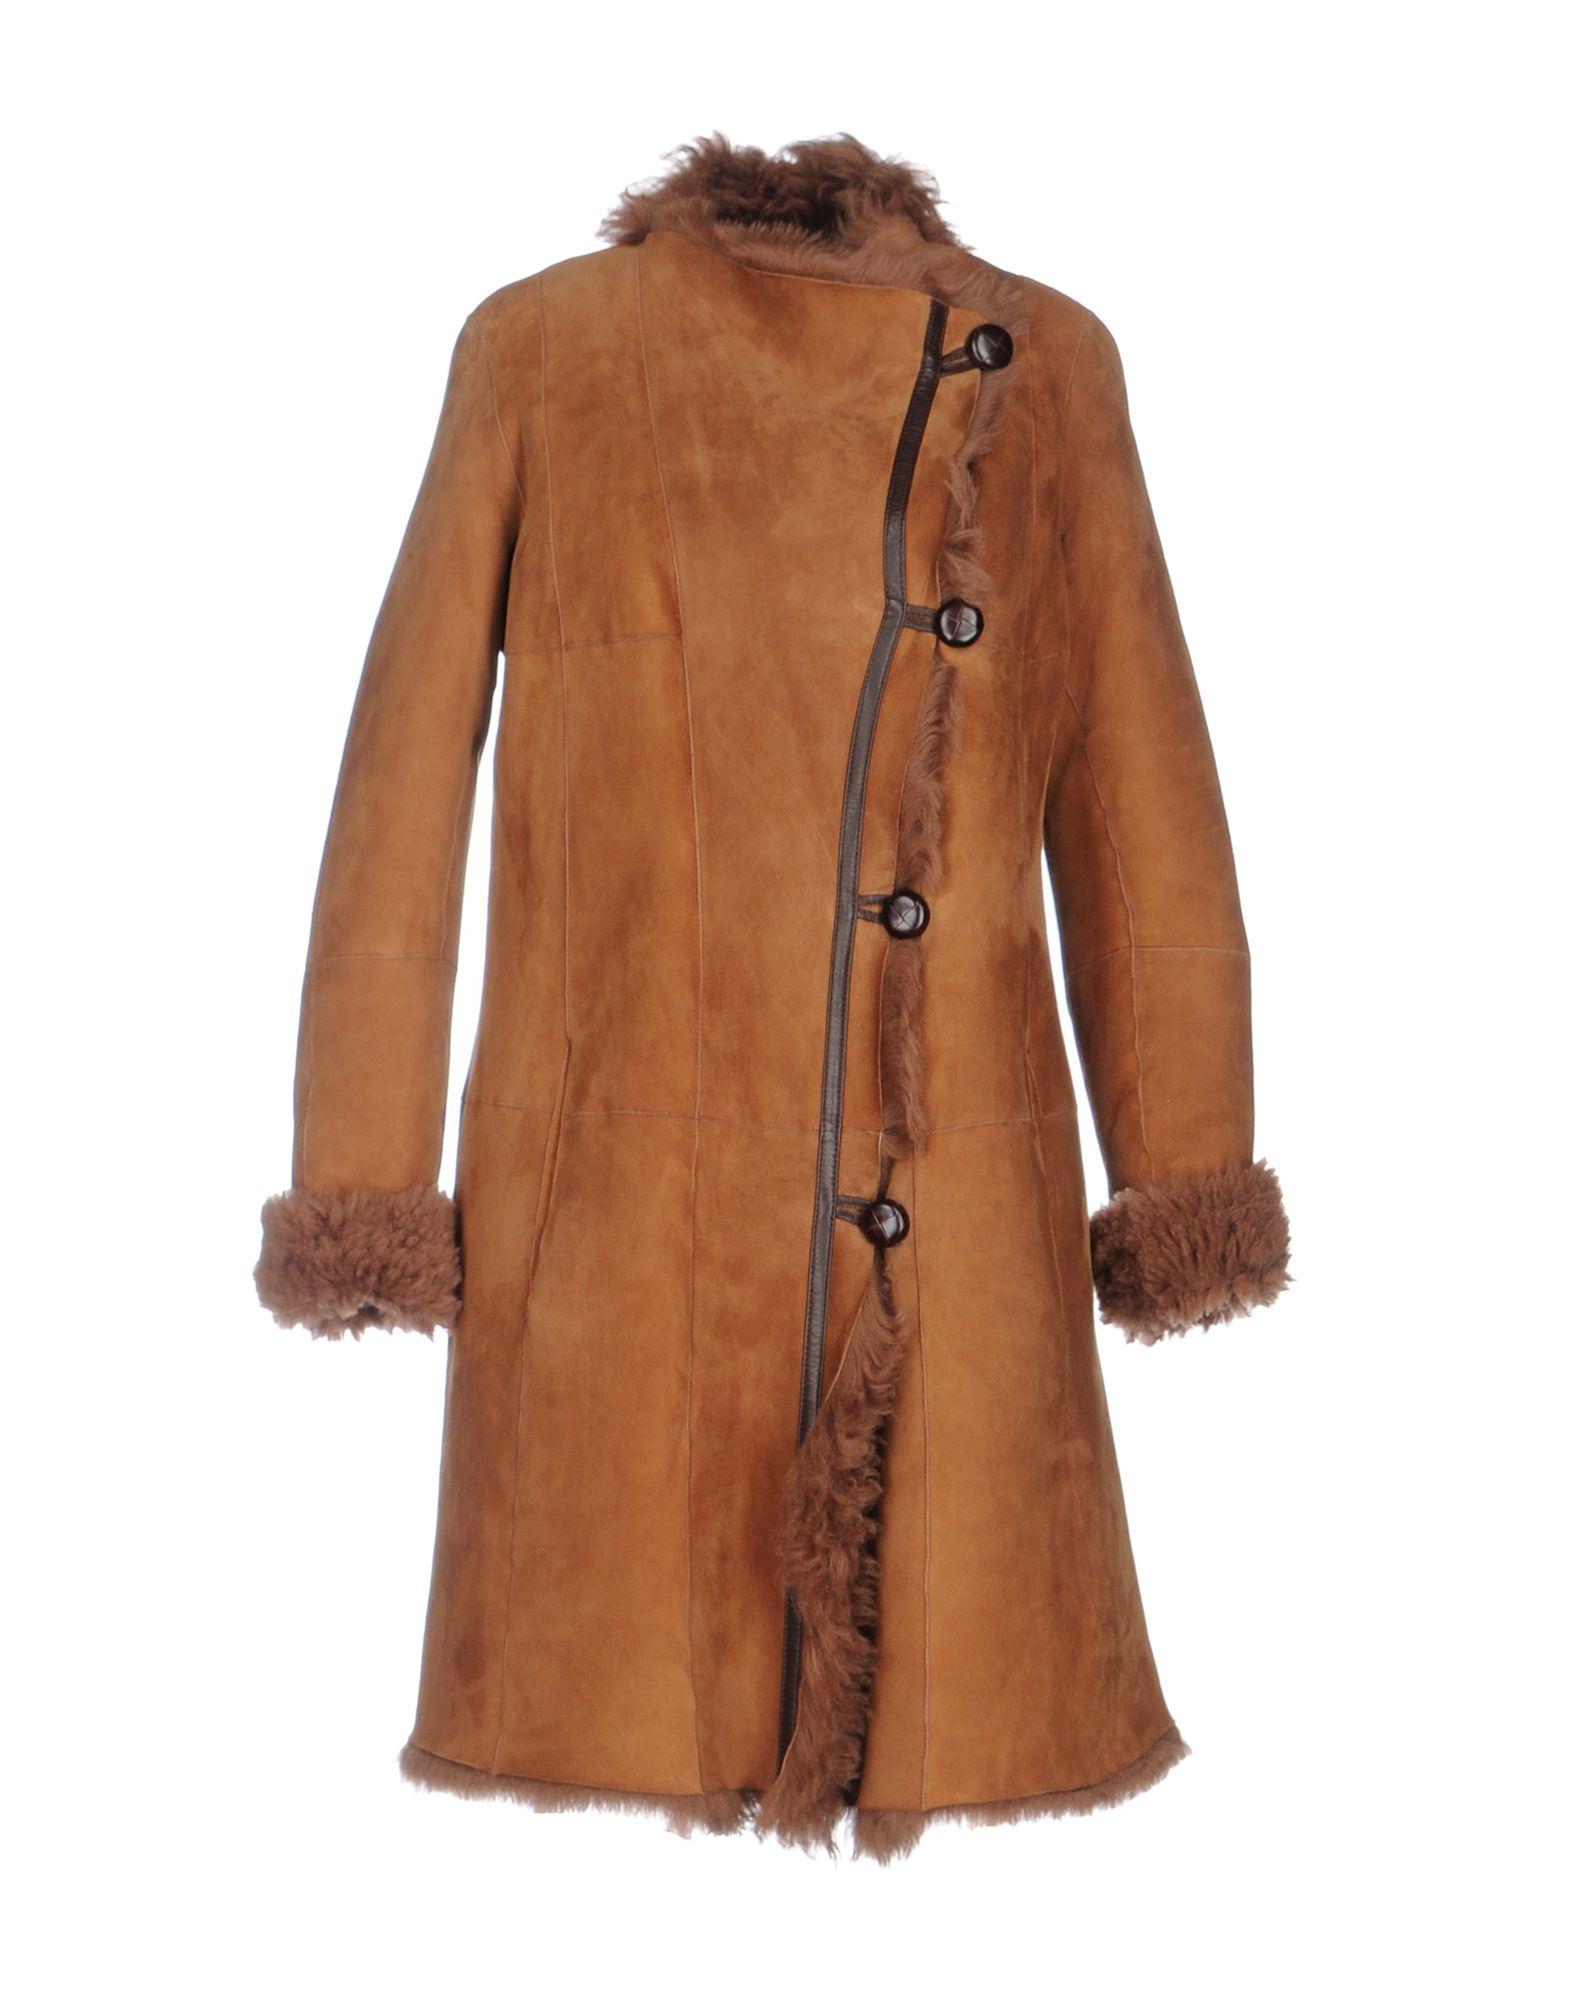 PHILOSOPHY di LORENZO SERAFINI Damen Mantel Farbe Braun Größe 4 - broschei